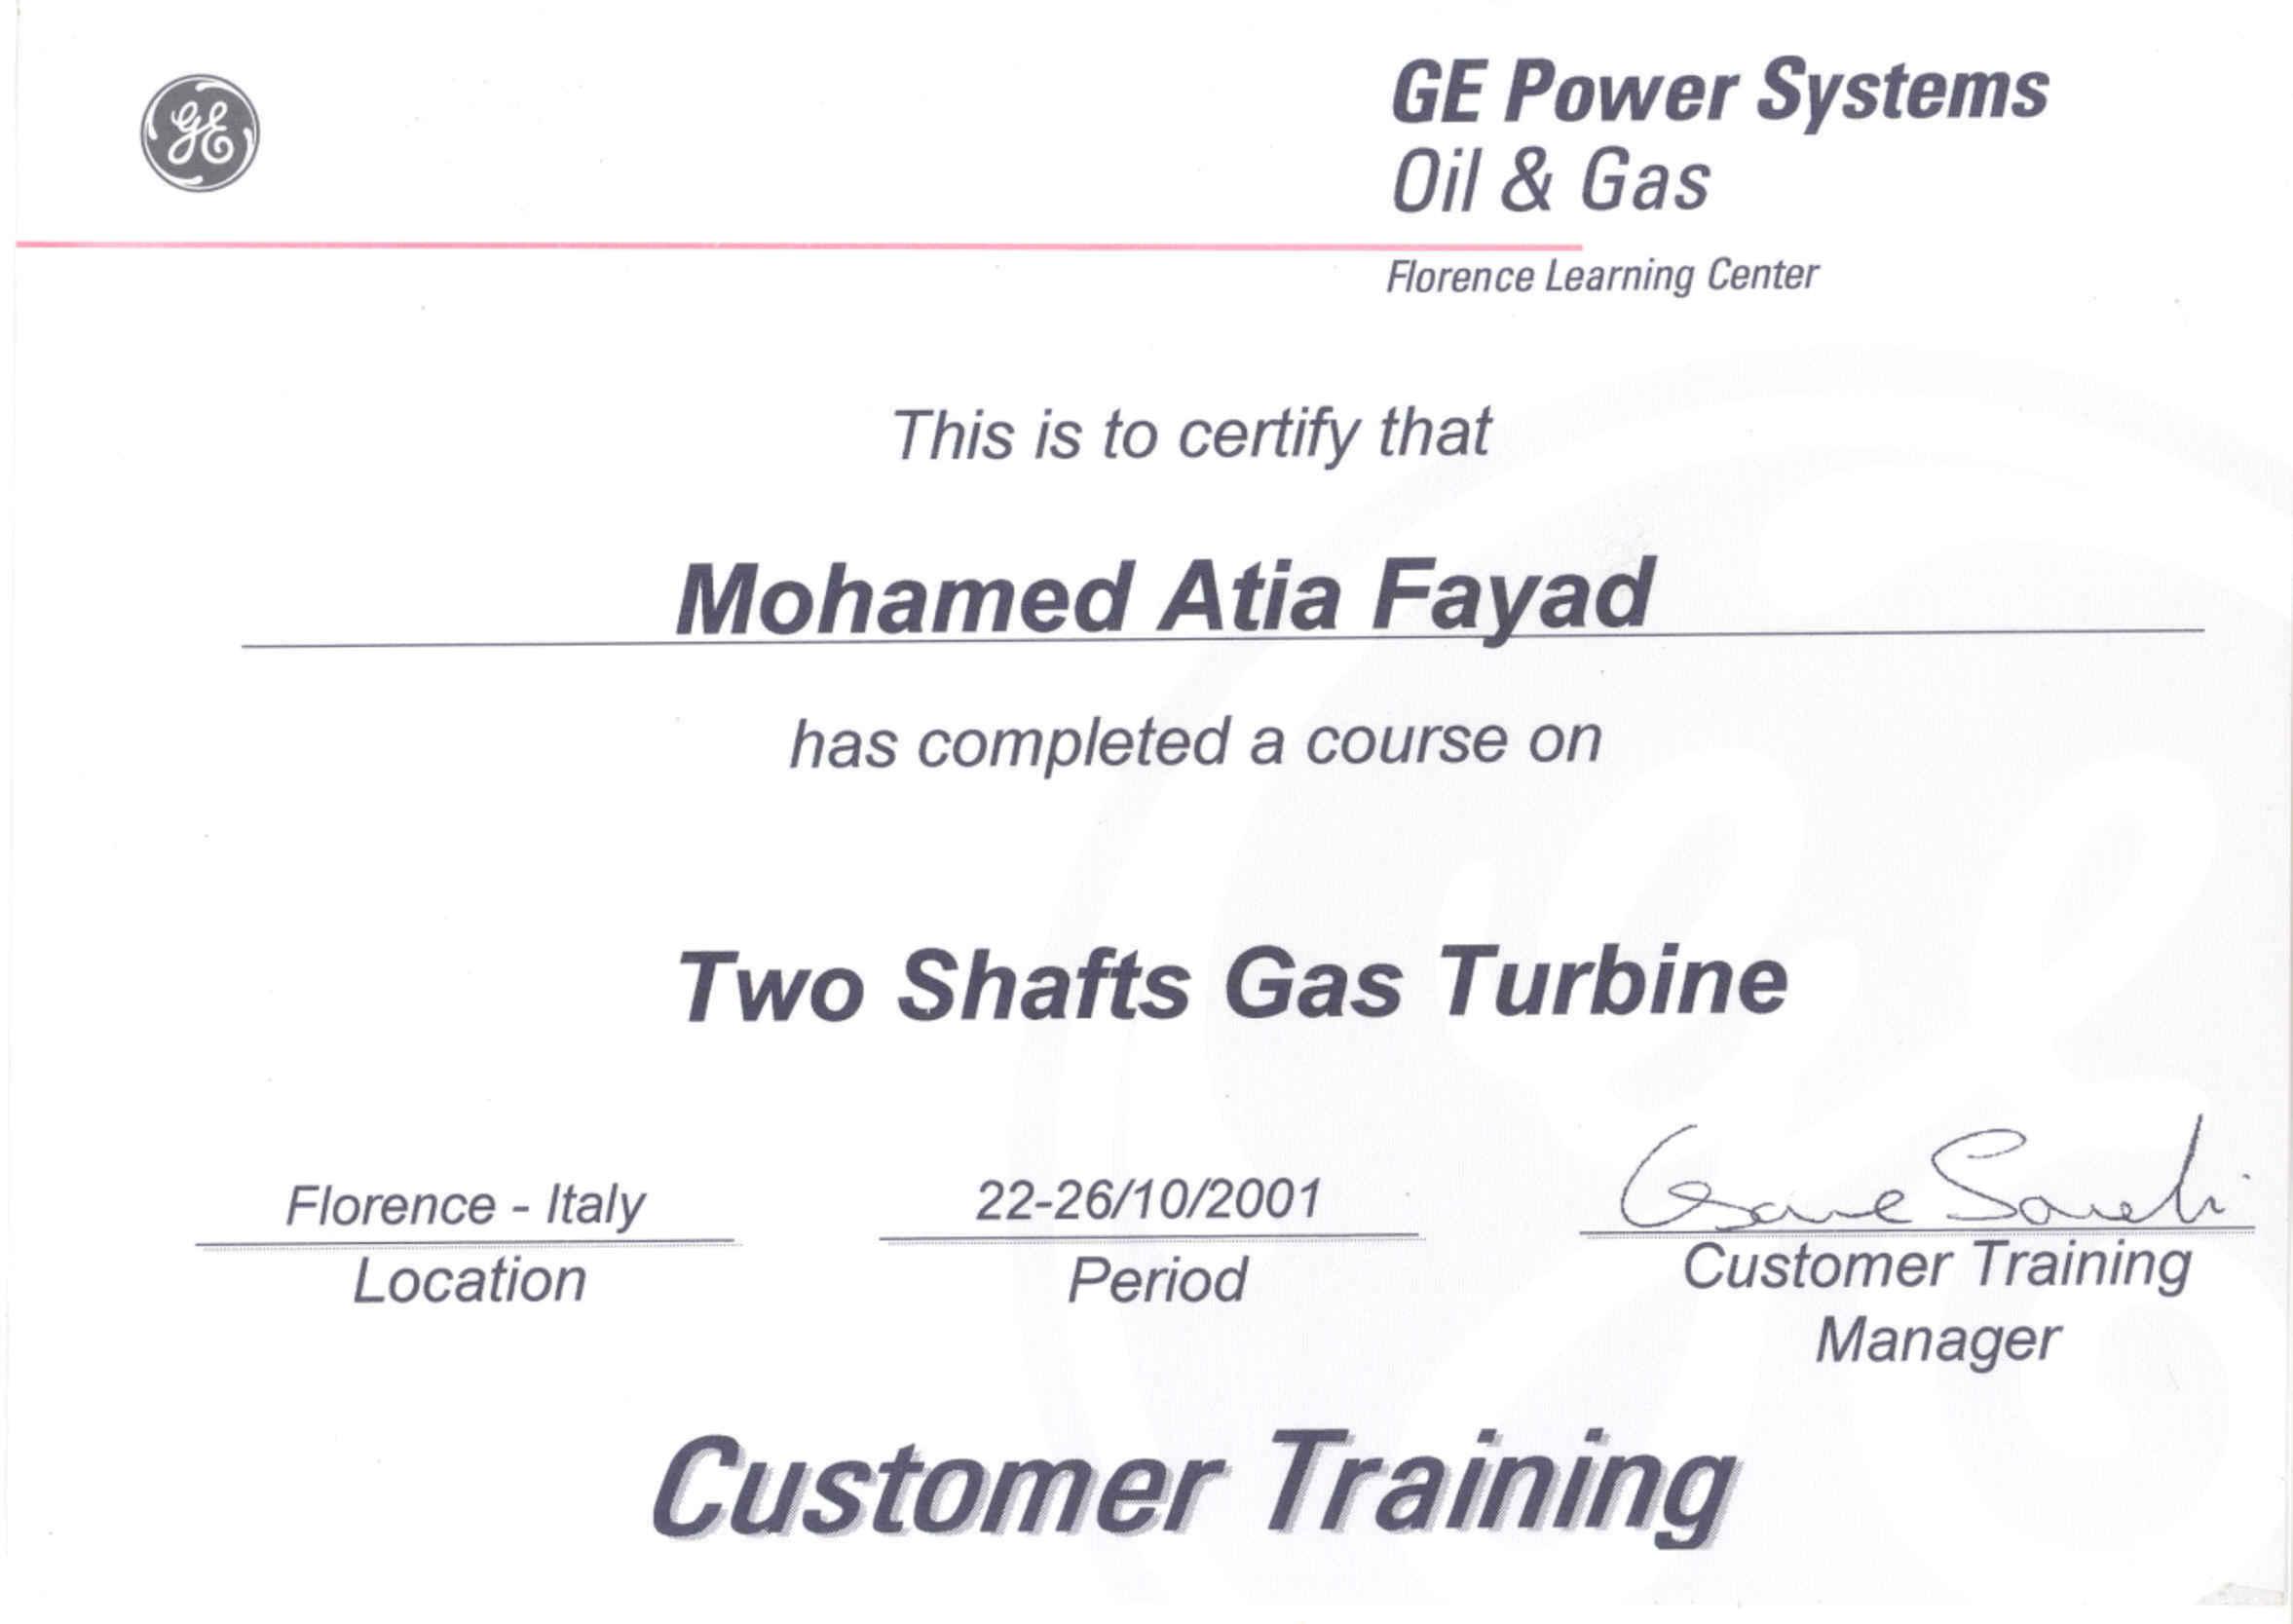 Mohamed Atia Fayad Bayt